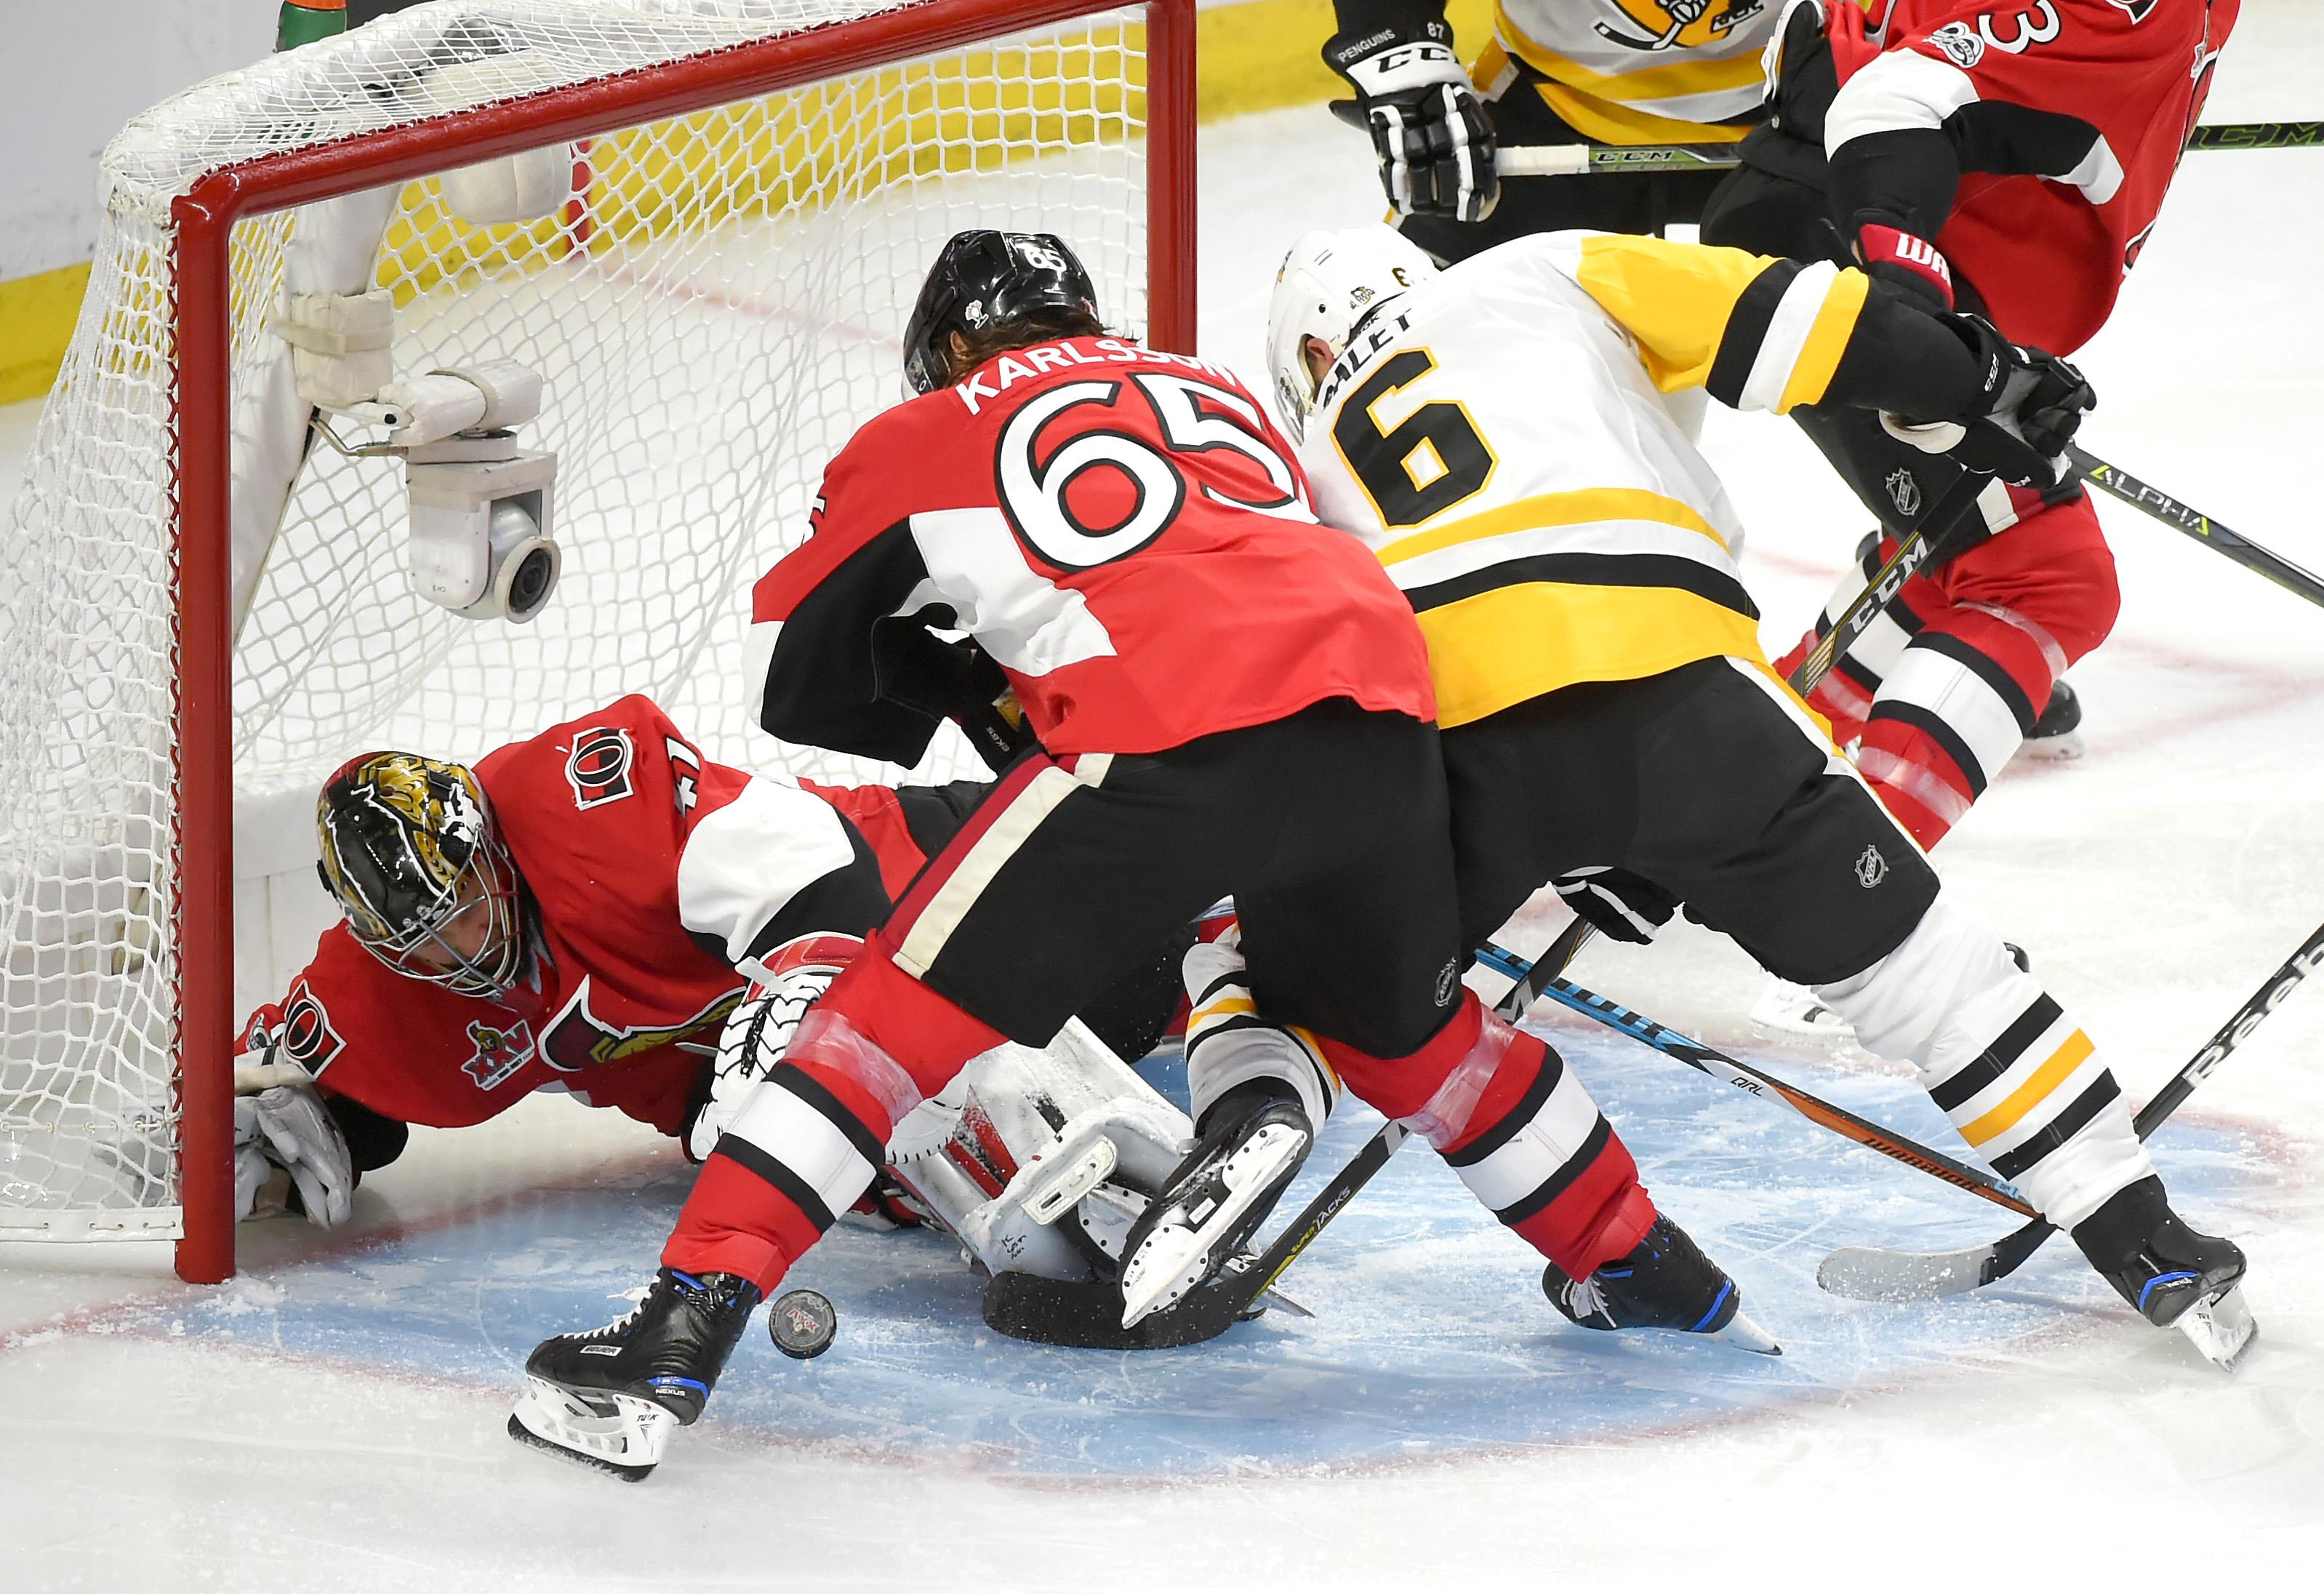 10071847-nhl-stanley-cup-playoffs-pittsburgh-penguins-at-ottawa-senators